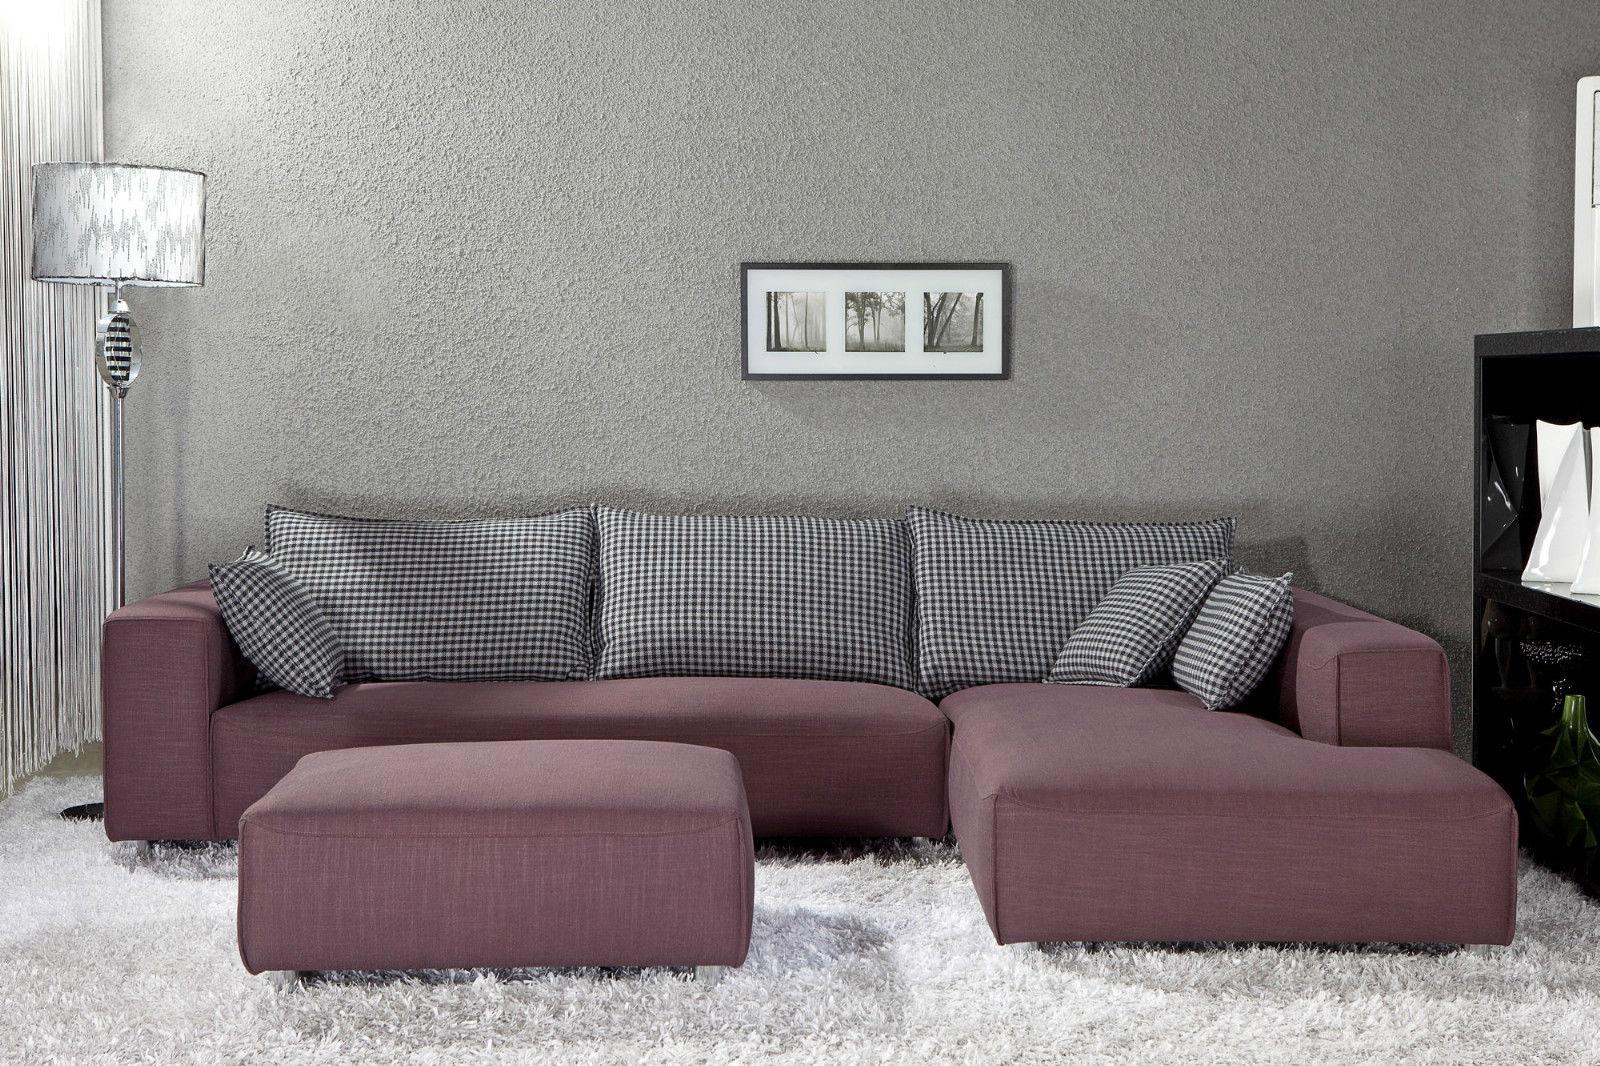 Apartment Patio Chaise